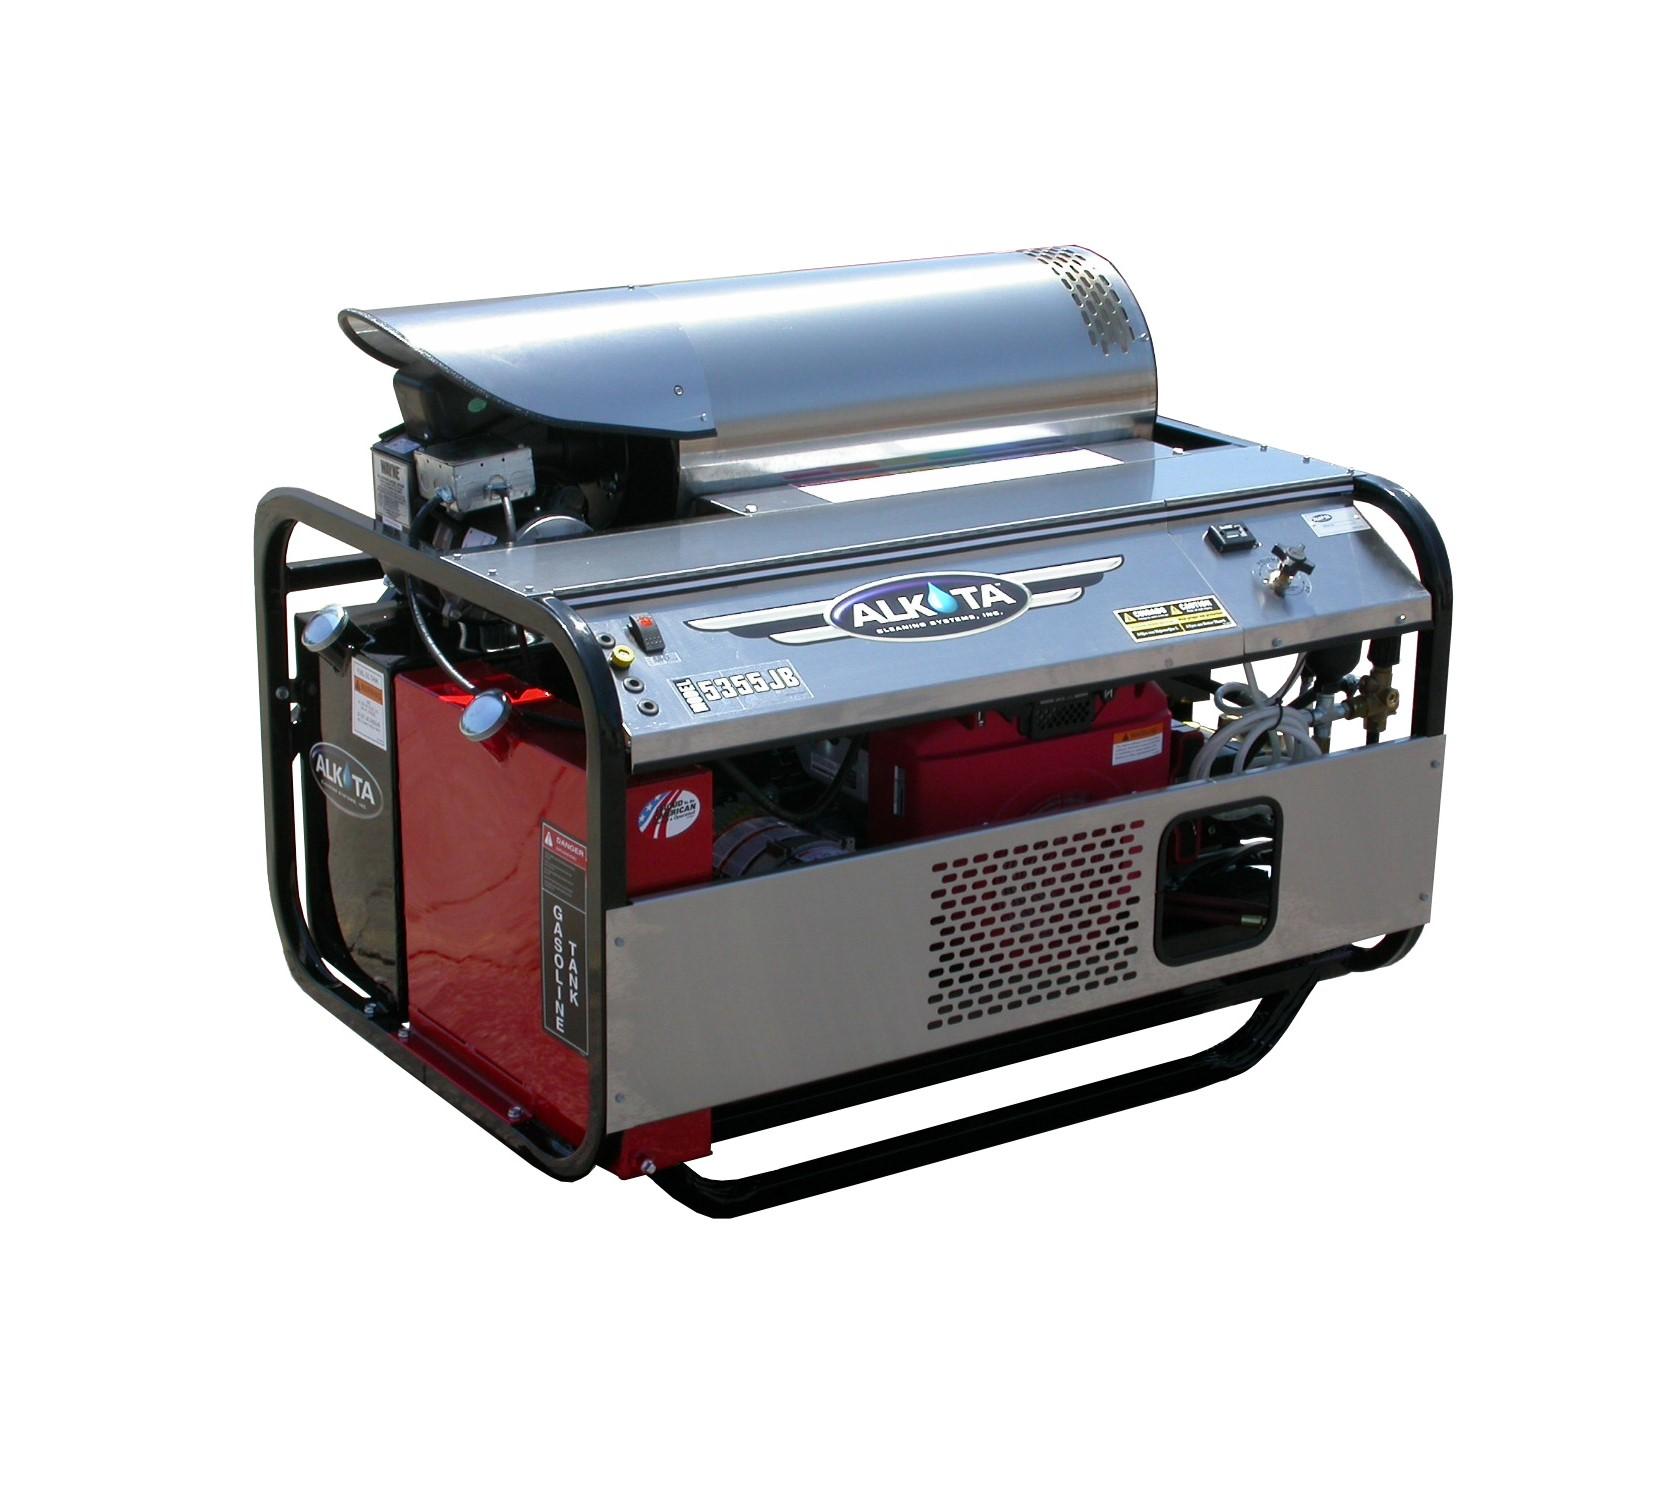 medium resolution of pressure washer hot water gas engine 5355jb alkota alkota cleaningpressure washer hot water gas engine 5355jb